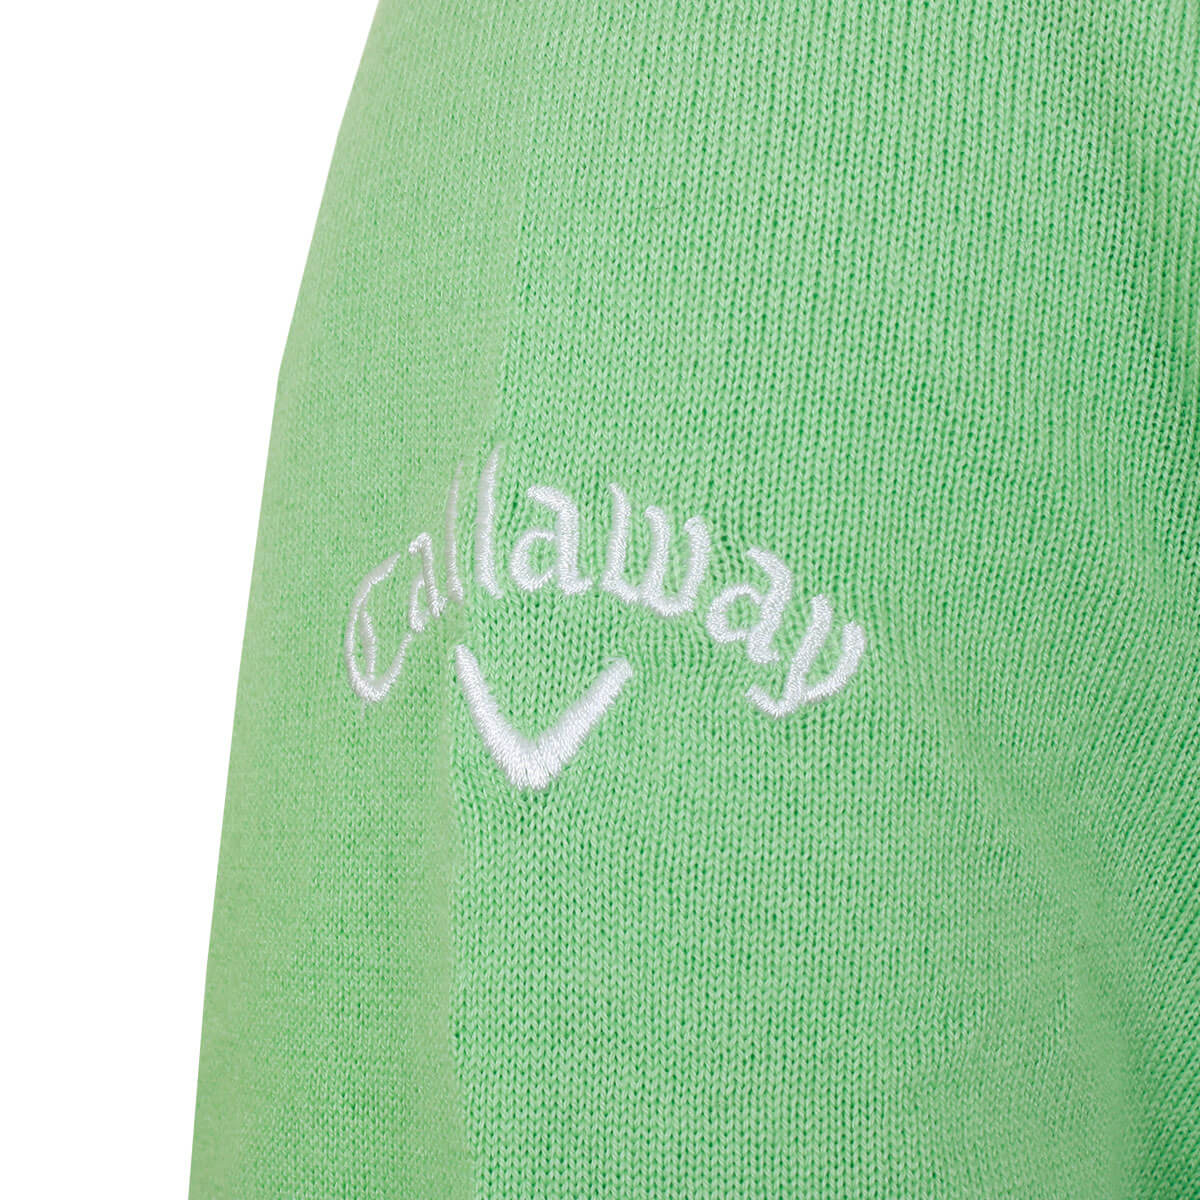 Callaway-Golf-Mens-1-4-Zip-Mock-Merino-Windproof-Sweater-Pullover-43-OFF-RRP thumbnail 13